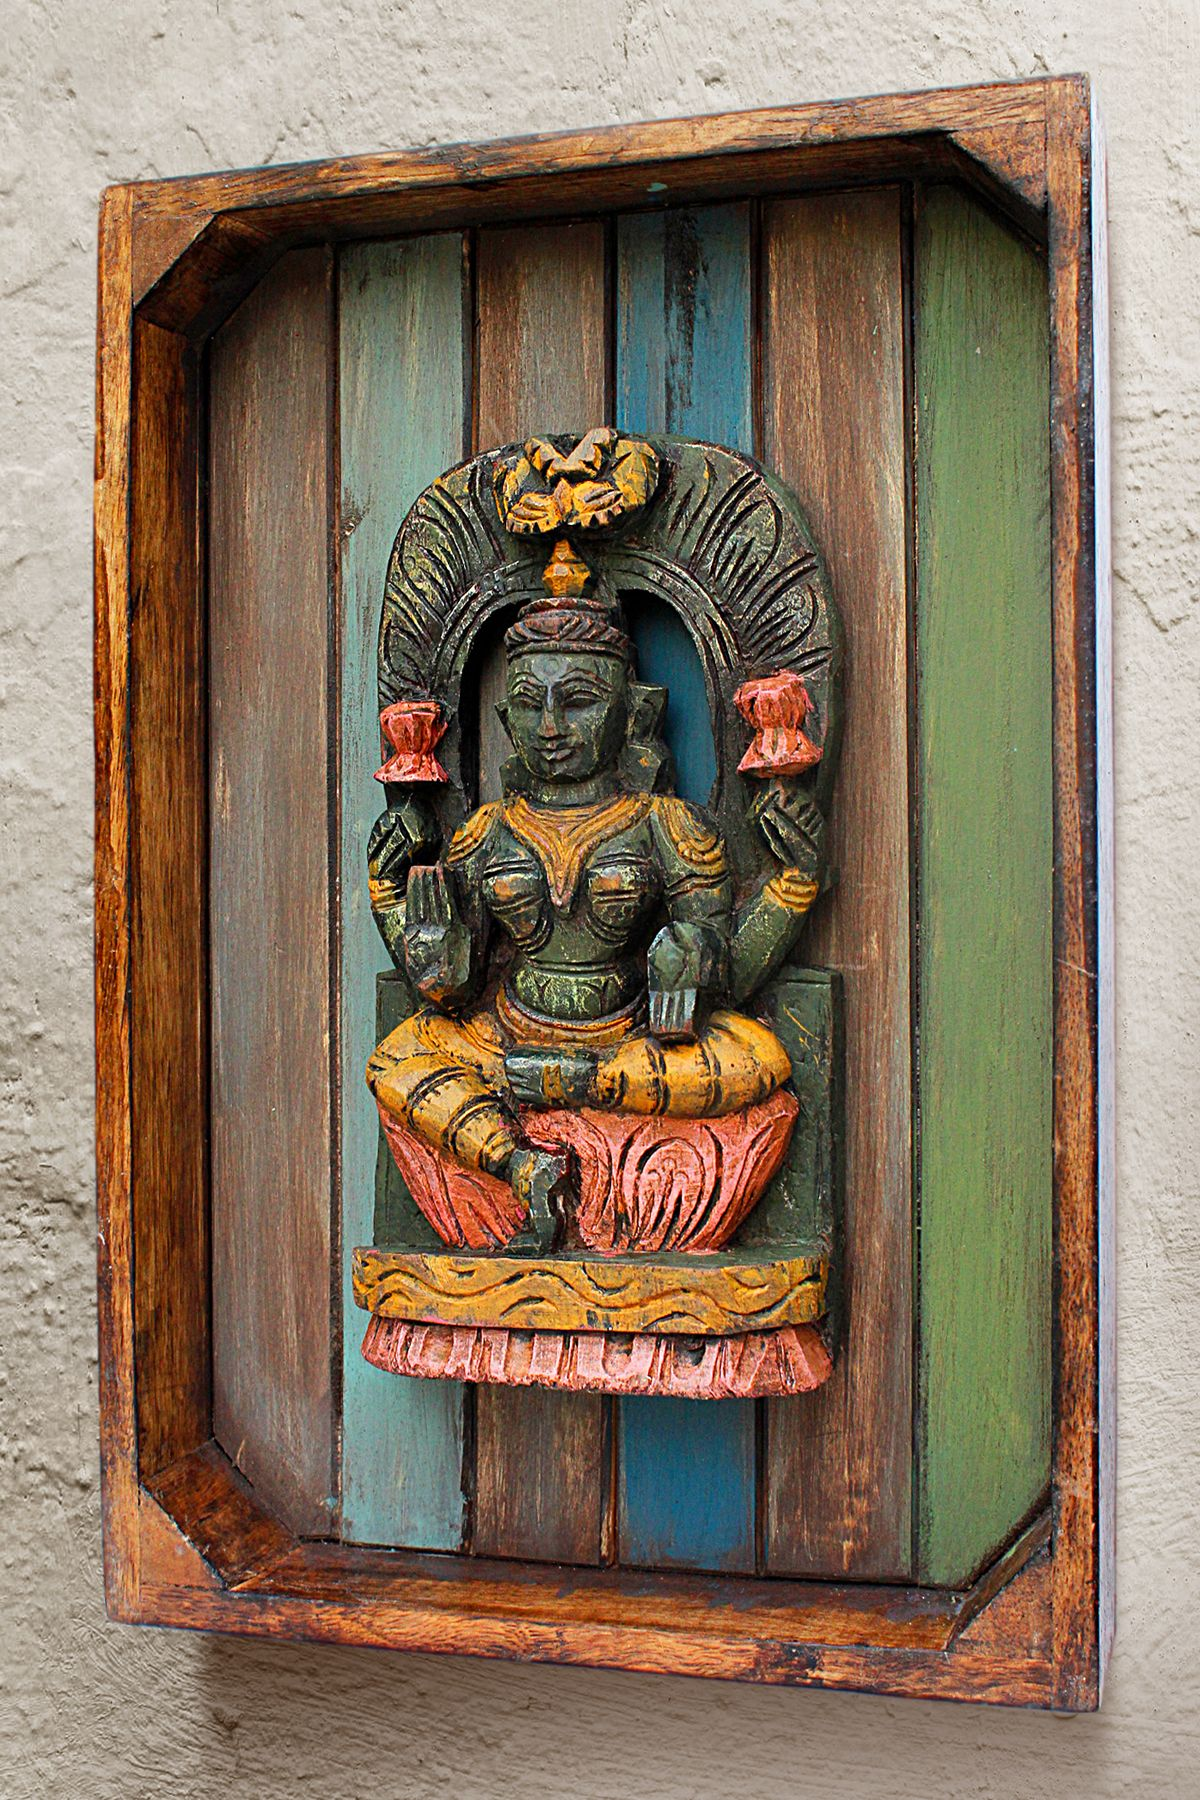 Bavas Wood Works Pooja Room Door Frame And Door Designs: Each Wooden And Metal Pieces Is Handpicked From Different